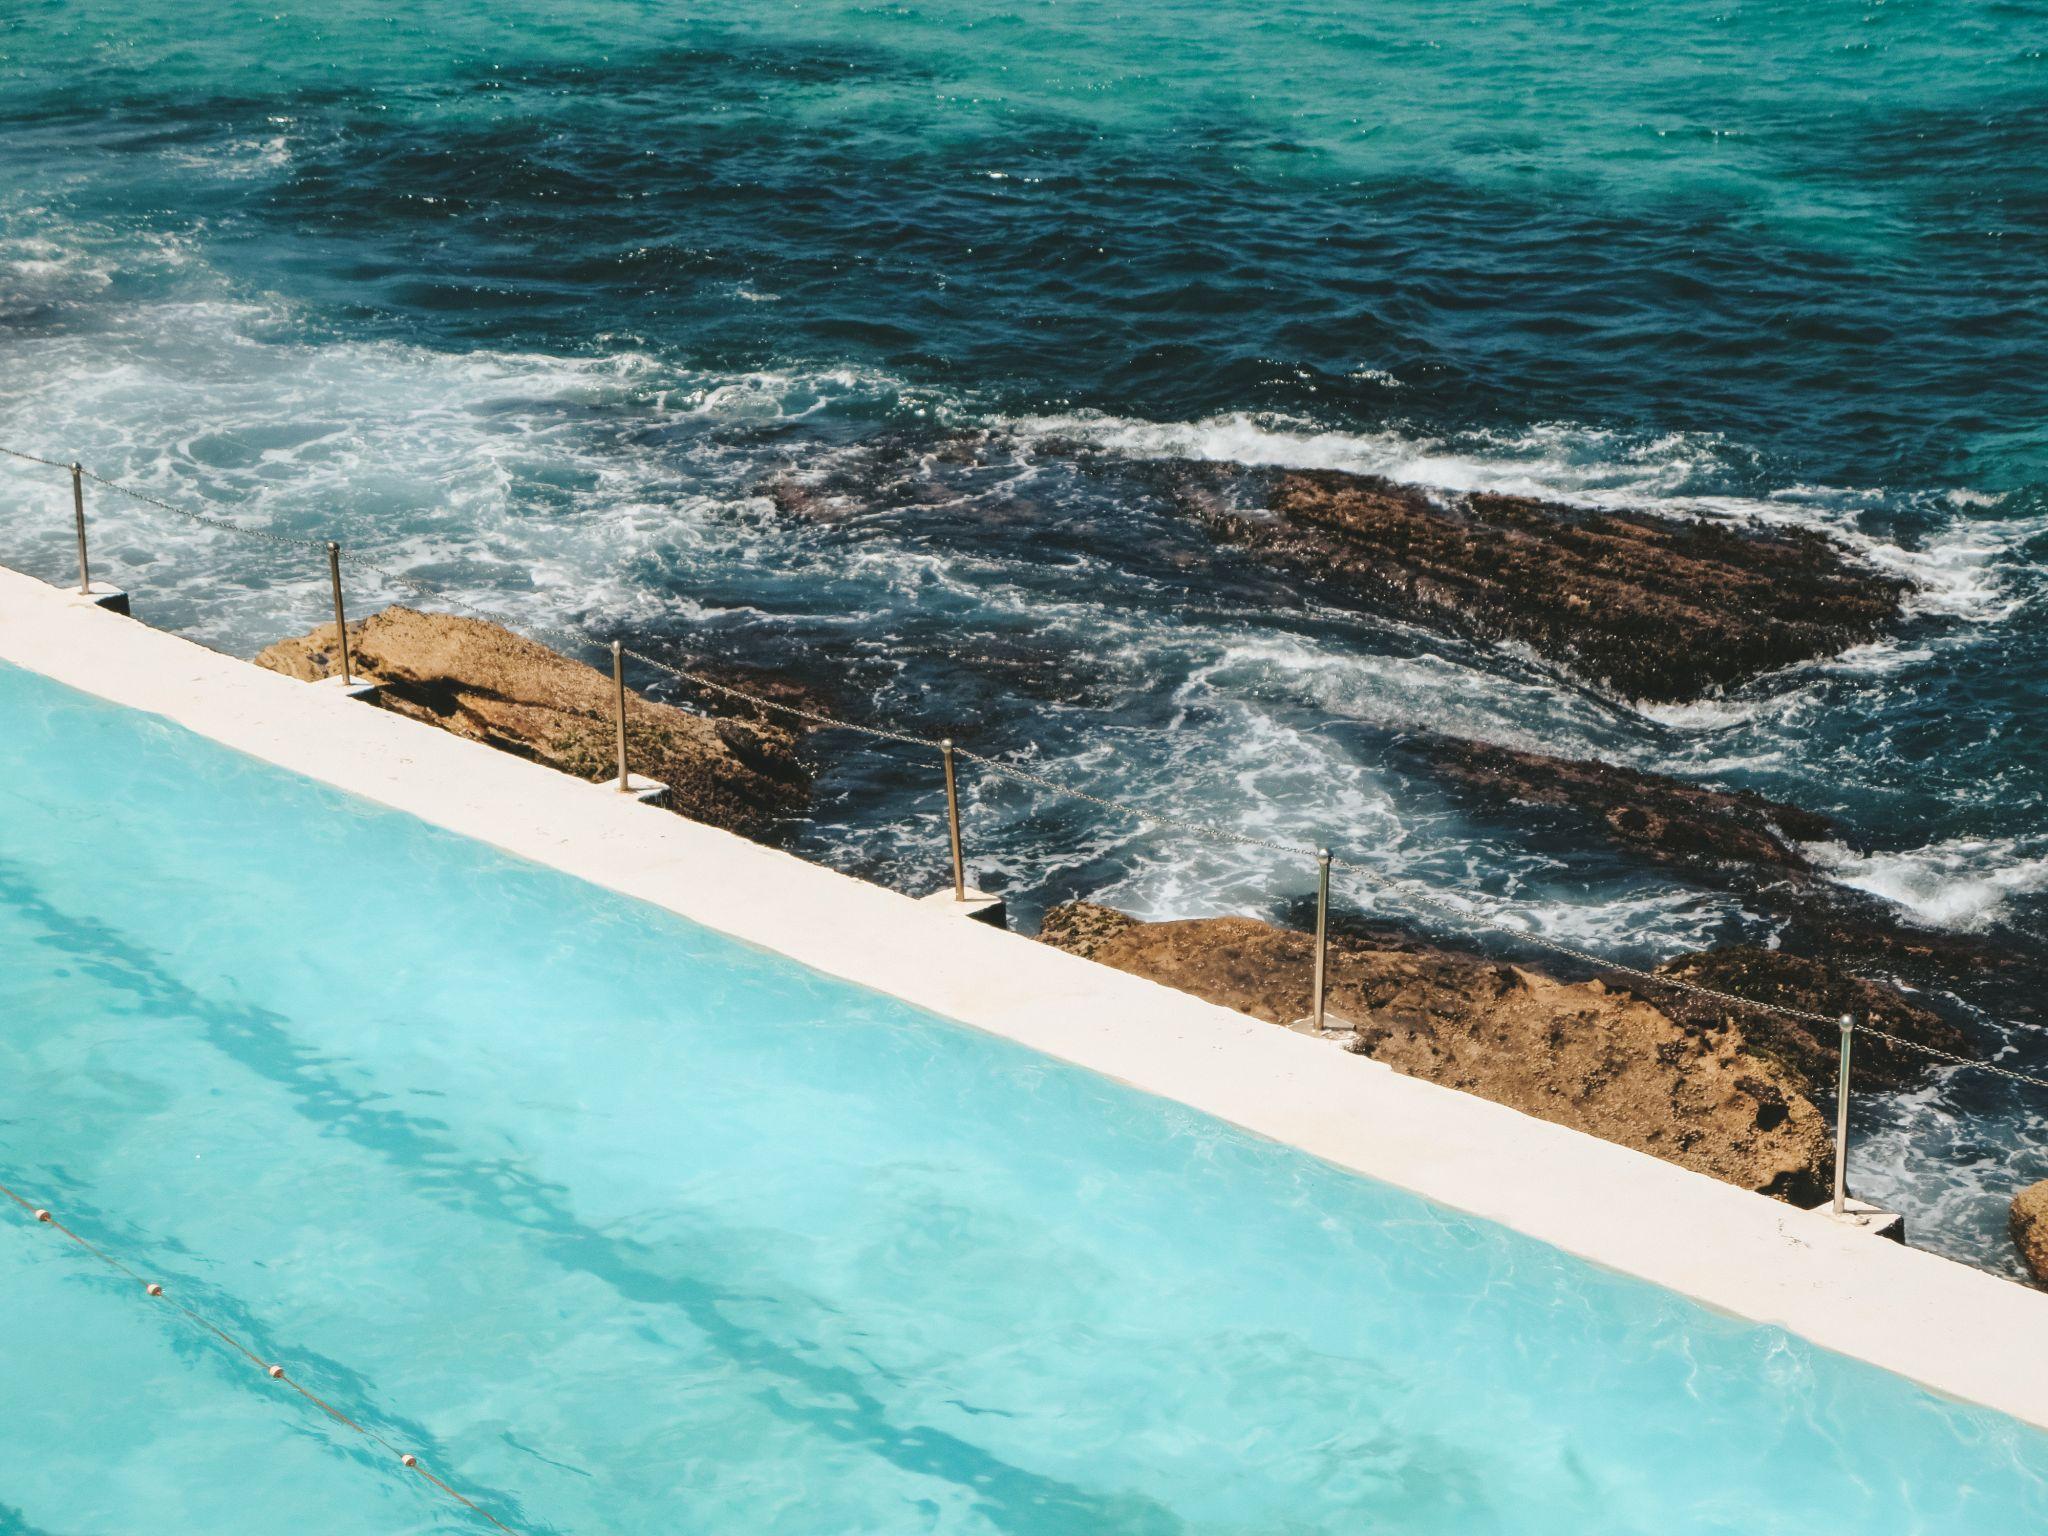 jana meerman bondi beach sydney australia (1)